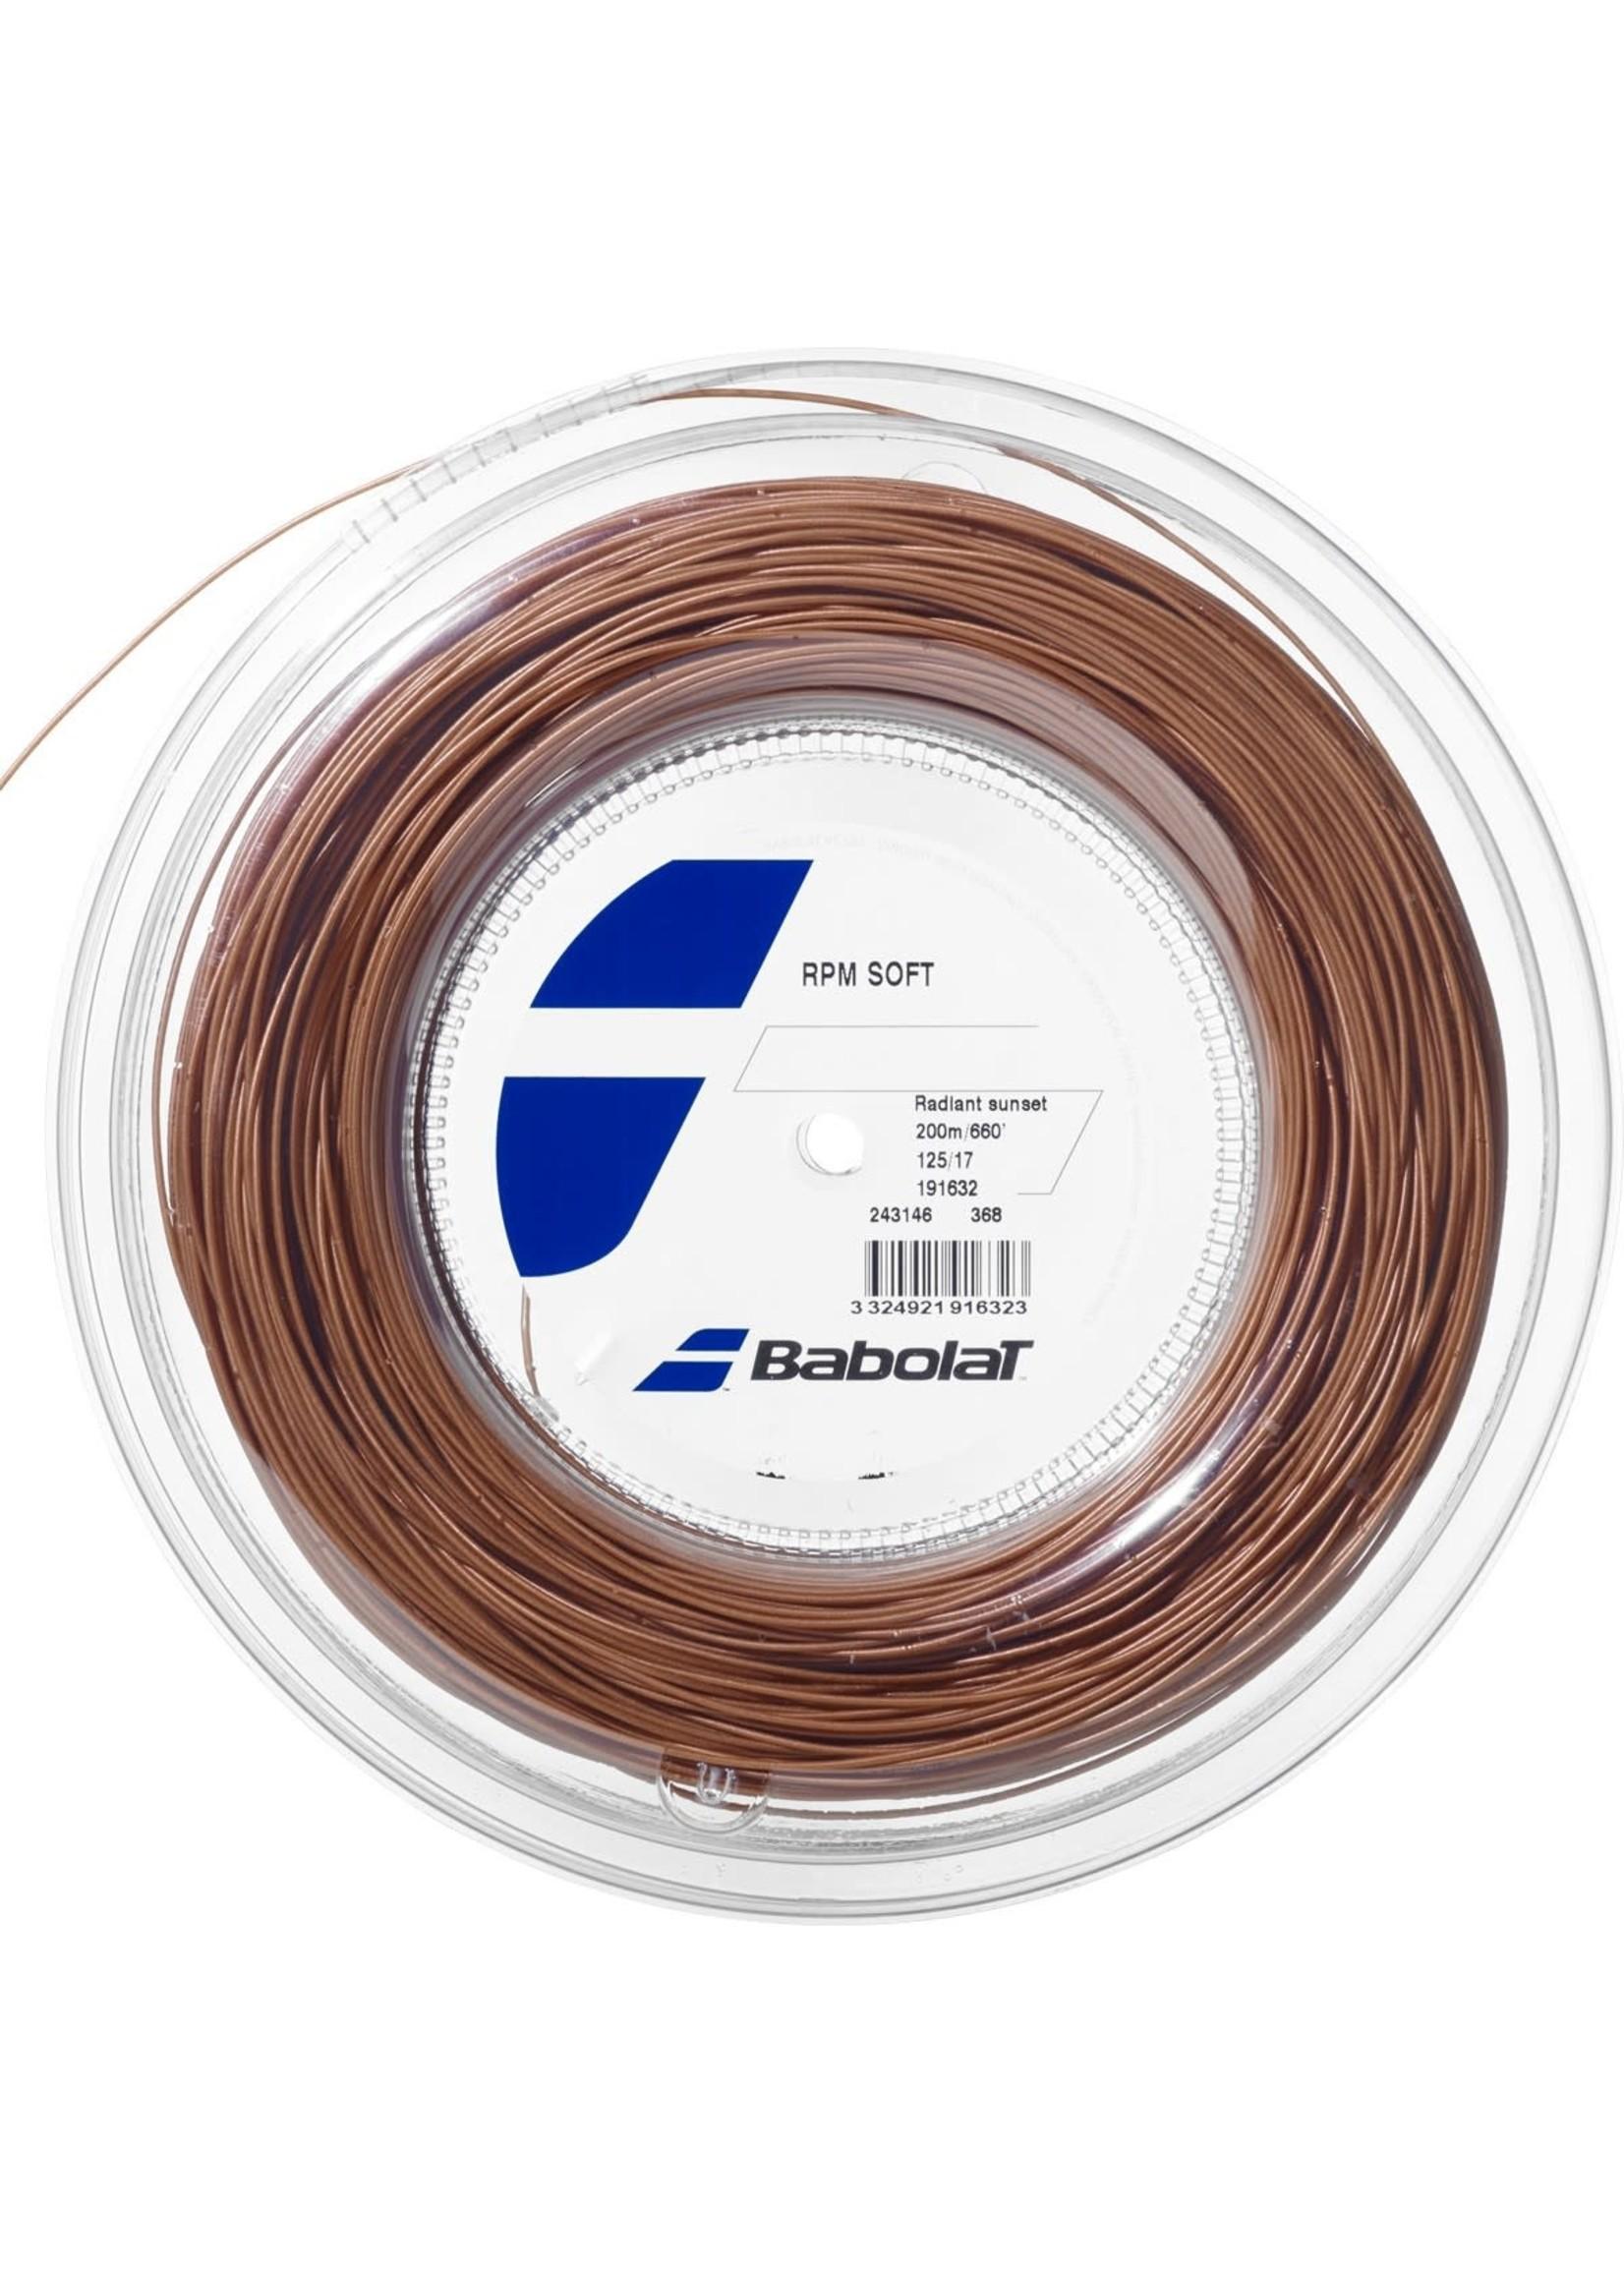 Babolat Babolat RPM Soft Tennis String (2022) - 200m Reel